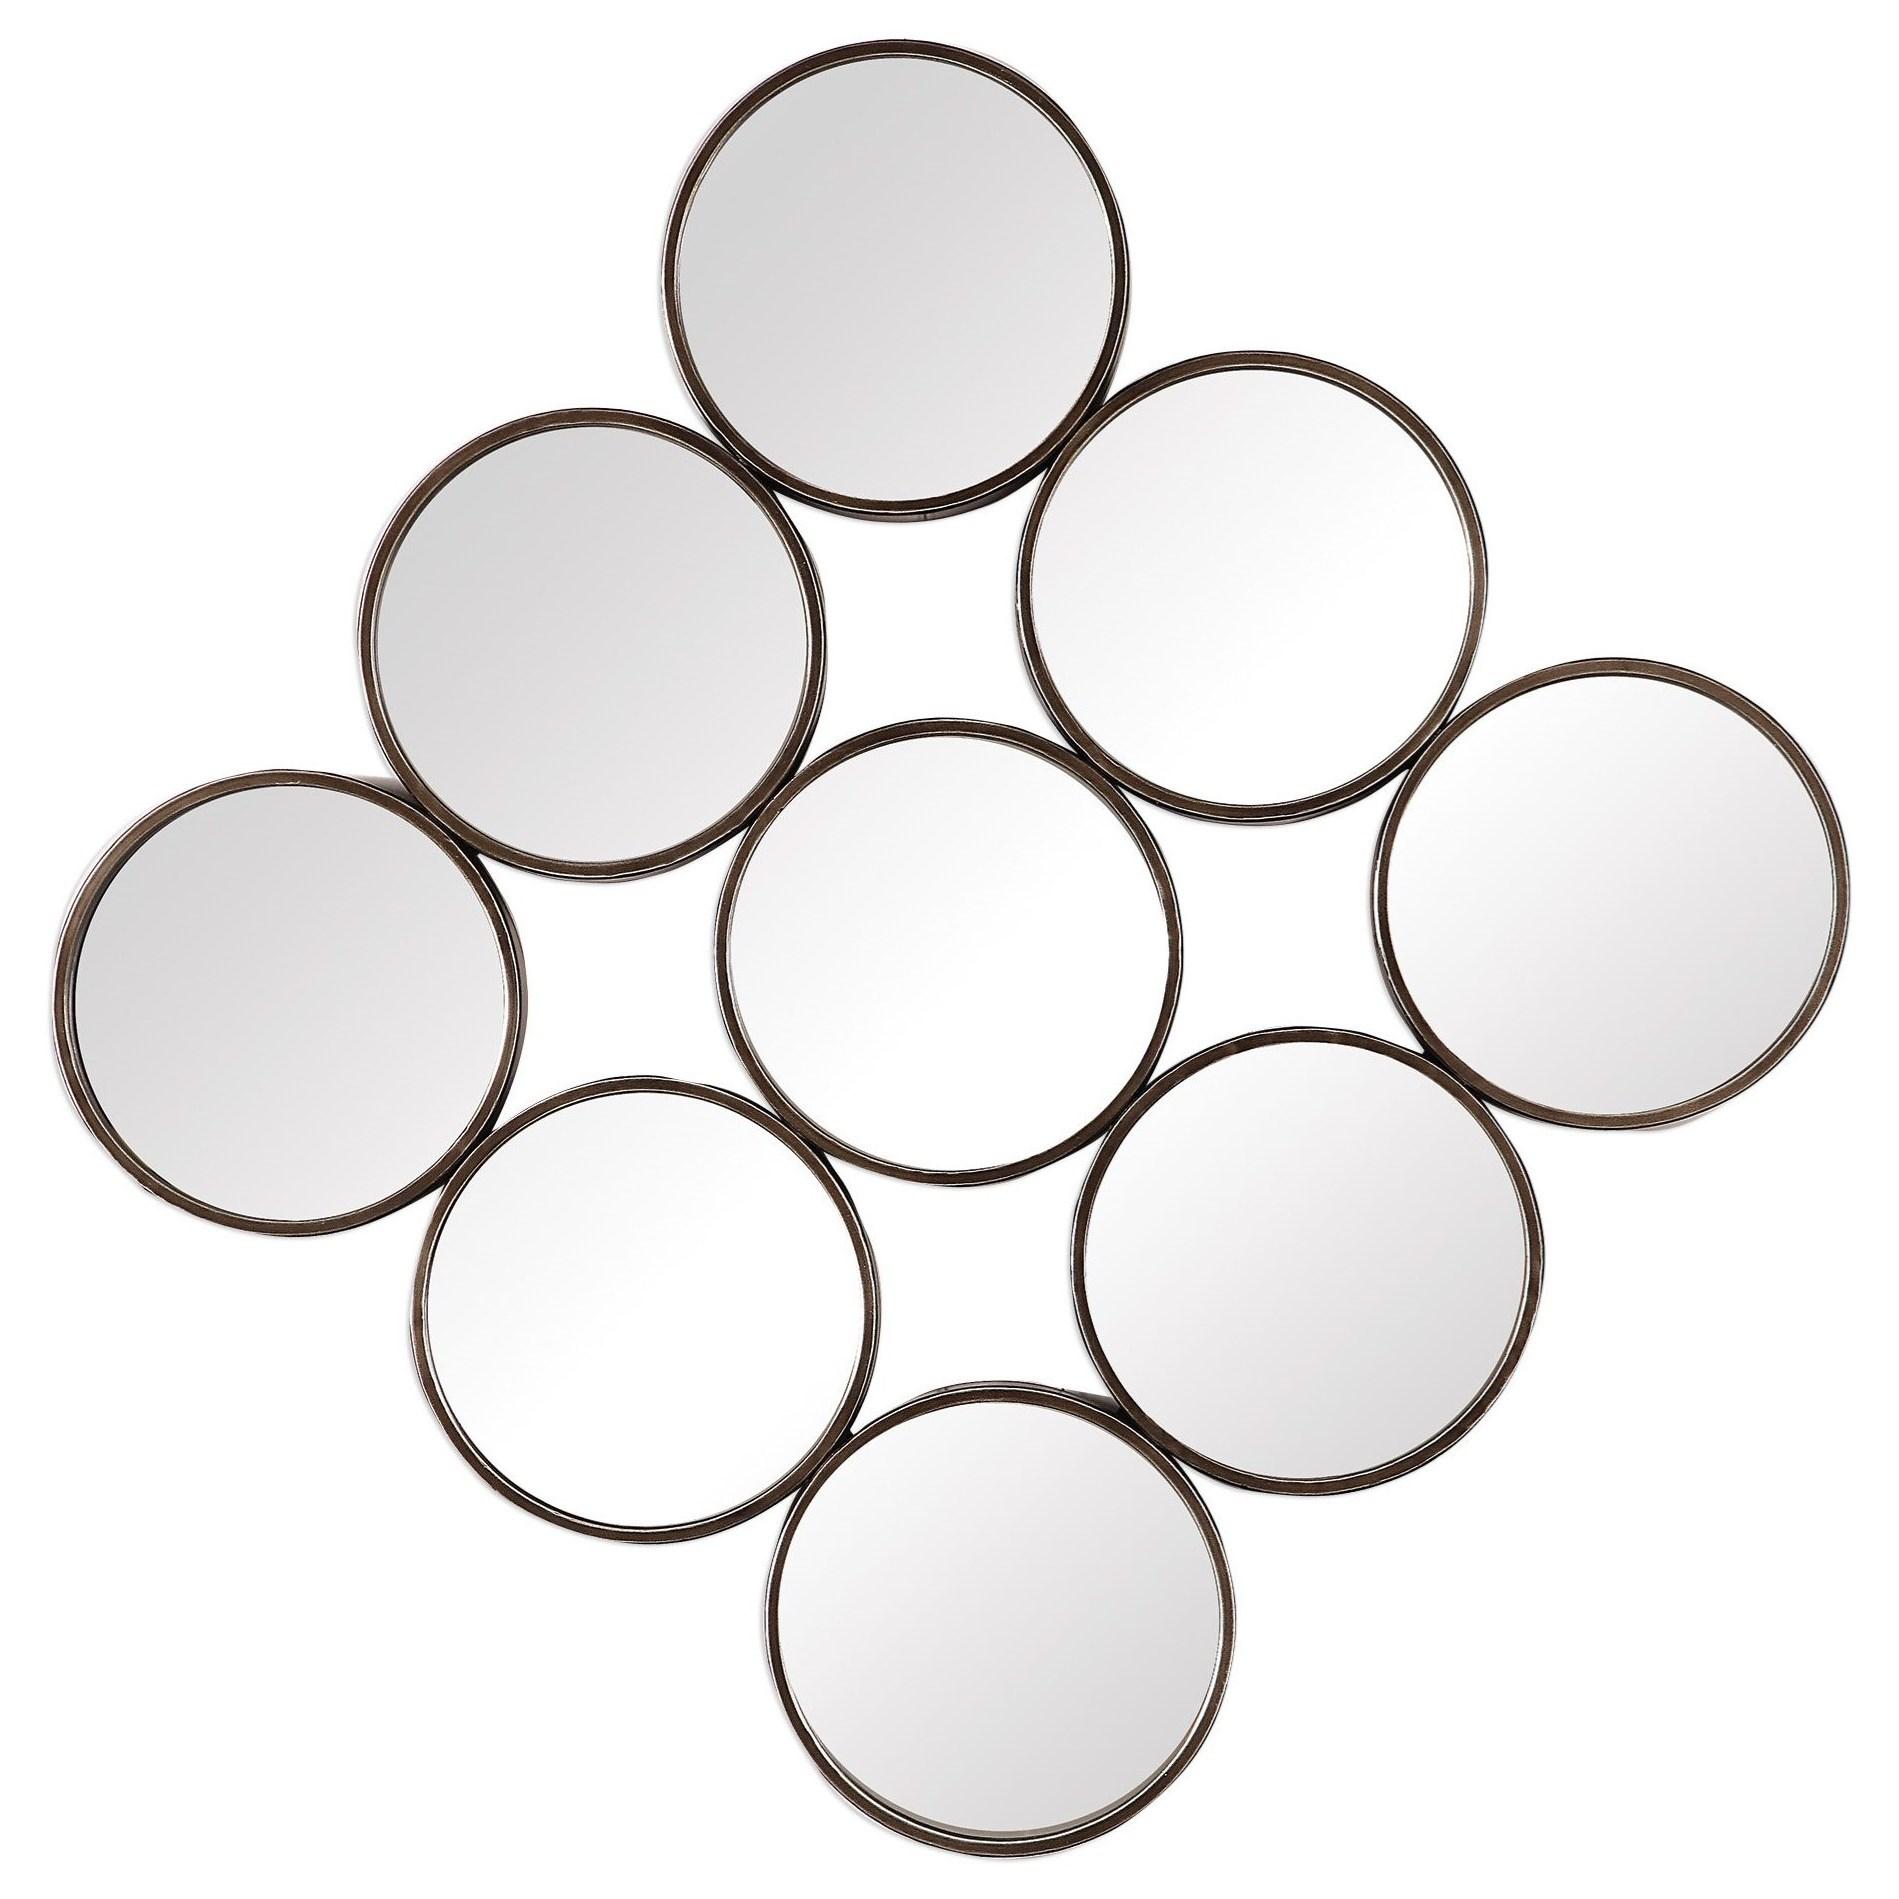 Devet Welded Iron Rings Mirror